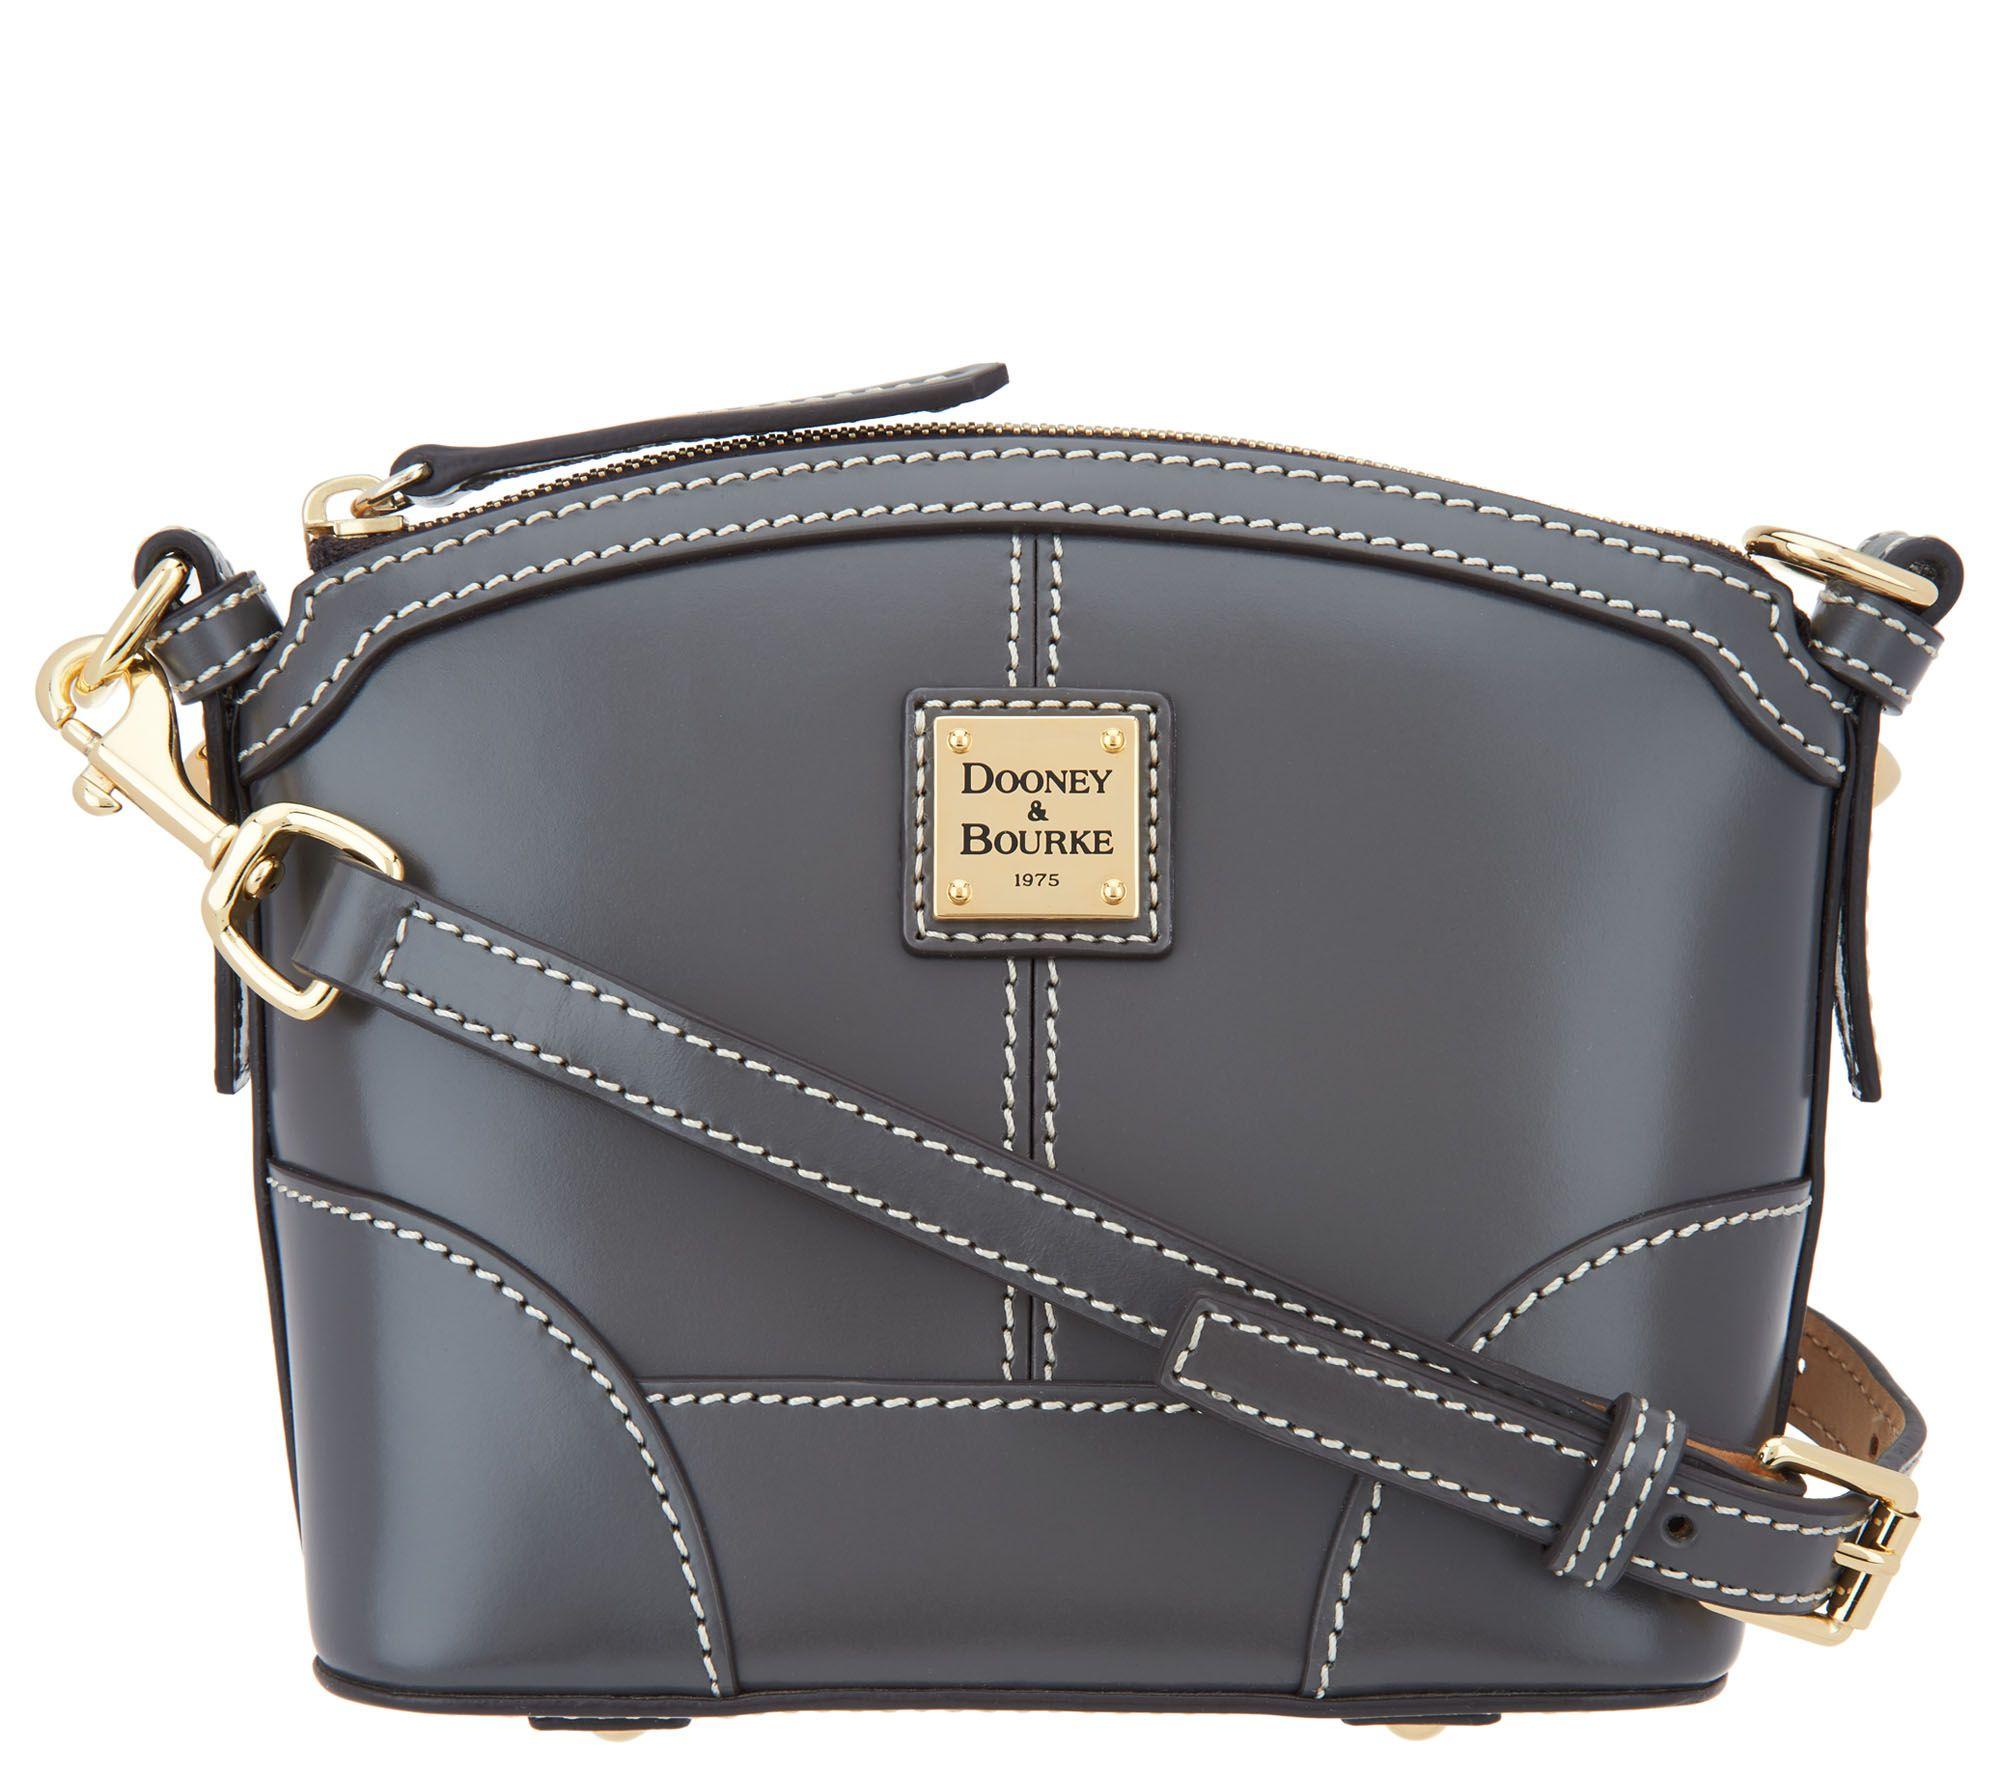 4000457fd2c Dooney   Bourke Selleria Florentine Leather Crossbody - Page 1 — QVC.com